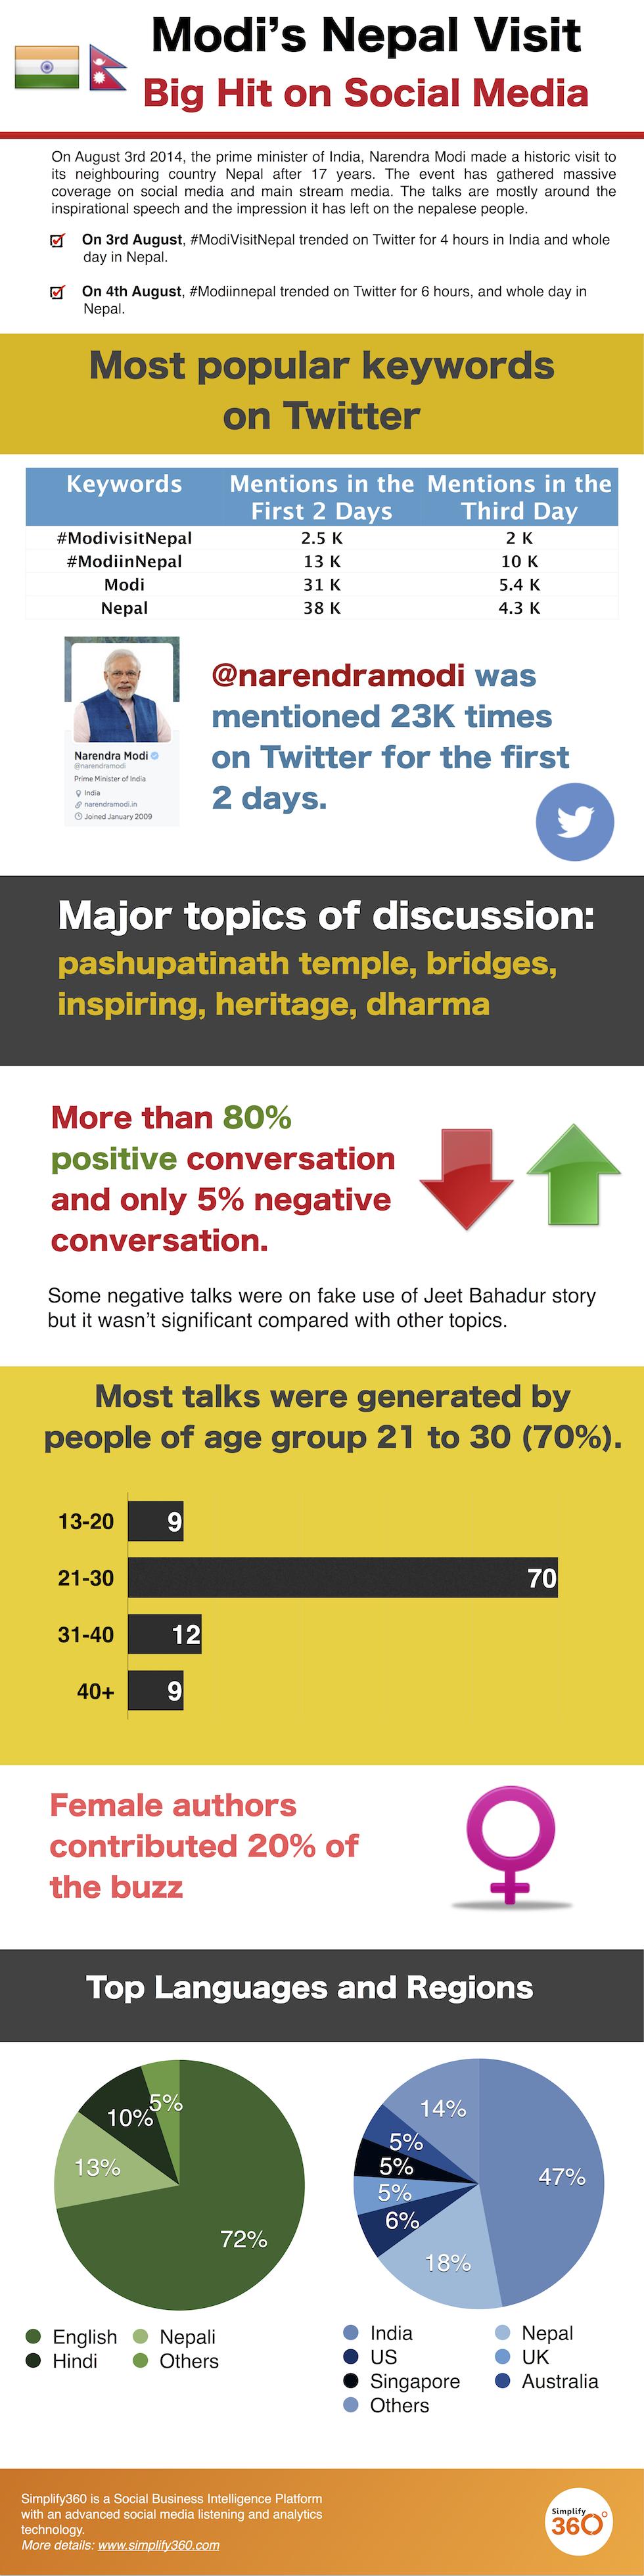 ModiInNepal- infographic